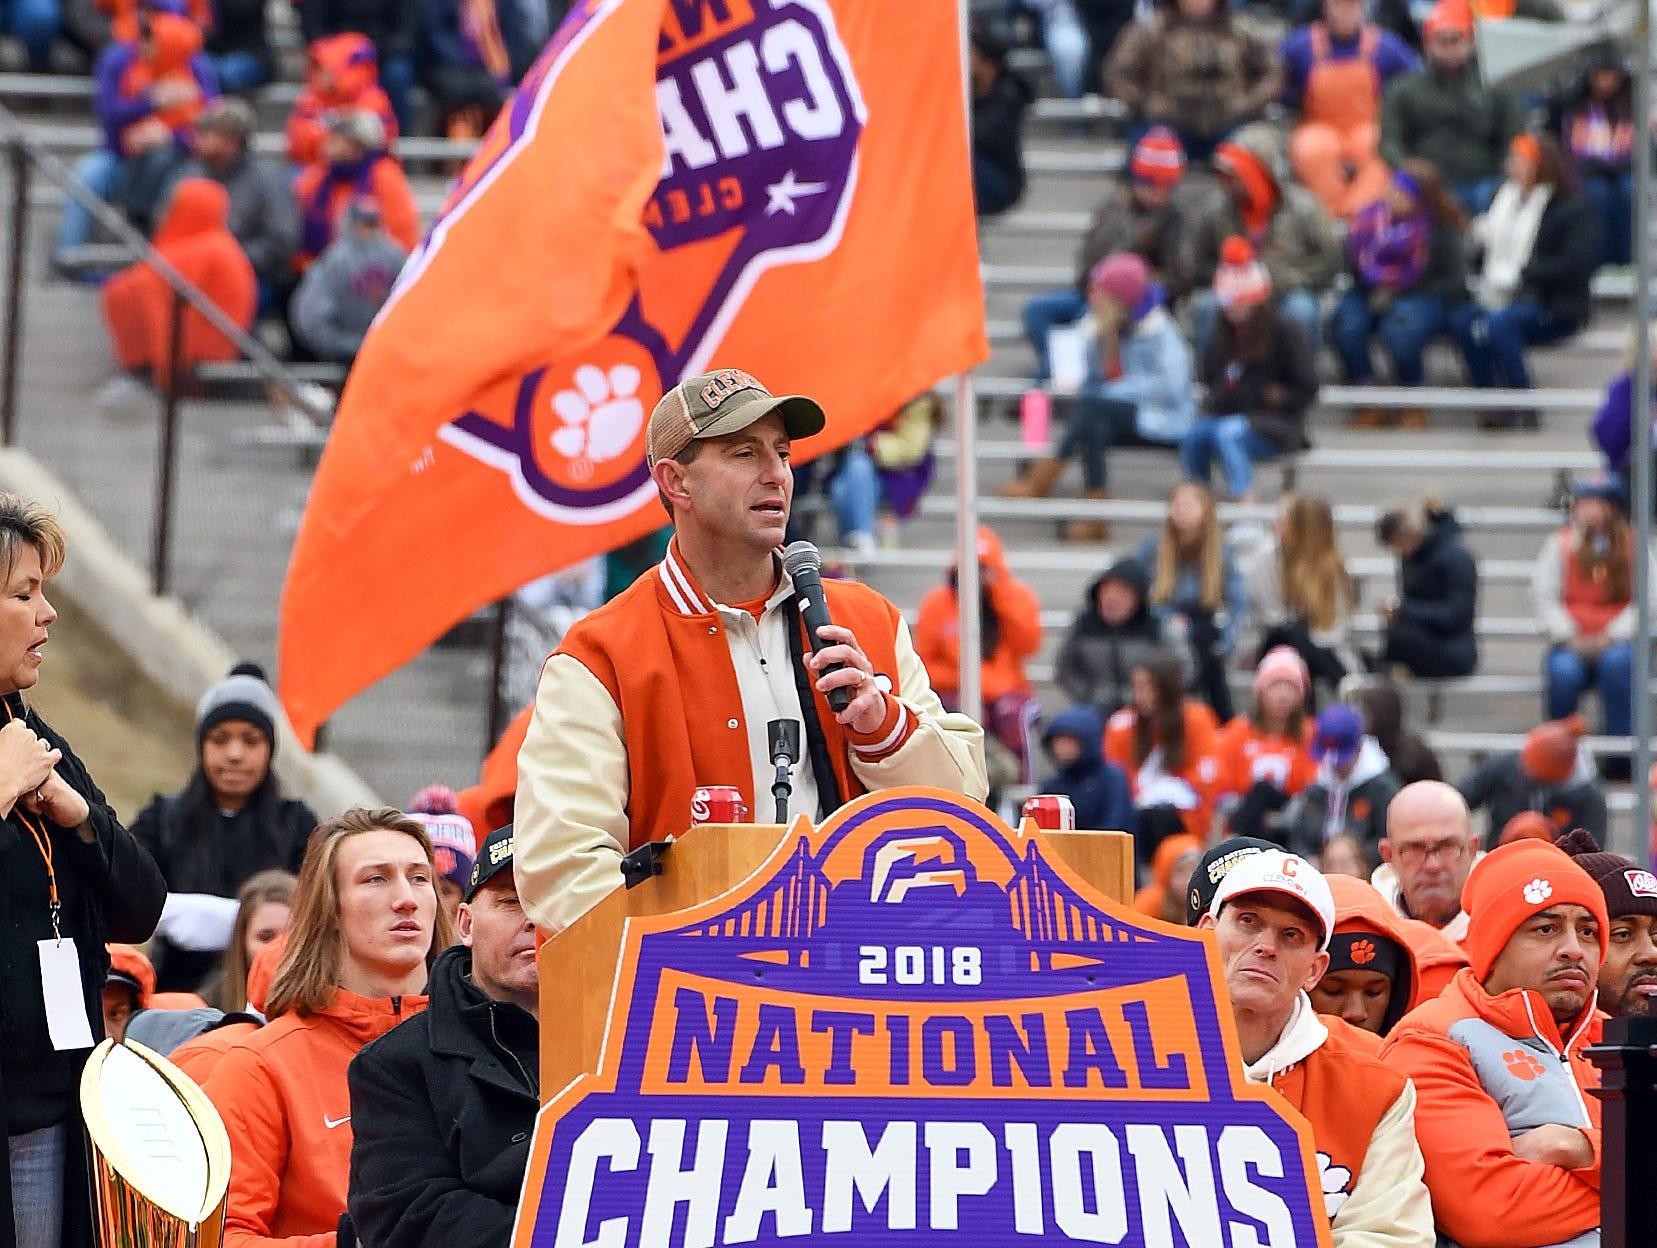 Clemson head coach Dabo Swinney speaks during the Tigers National Championship celebration Saturday, January 12, 2019 at Clemson's Memorial Stadium.